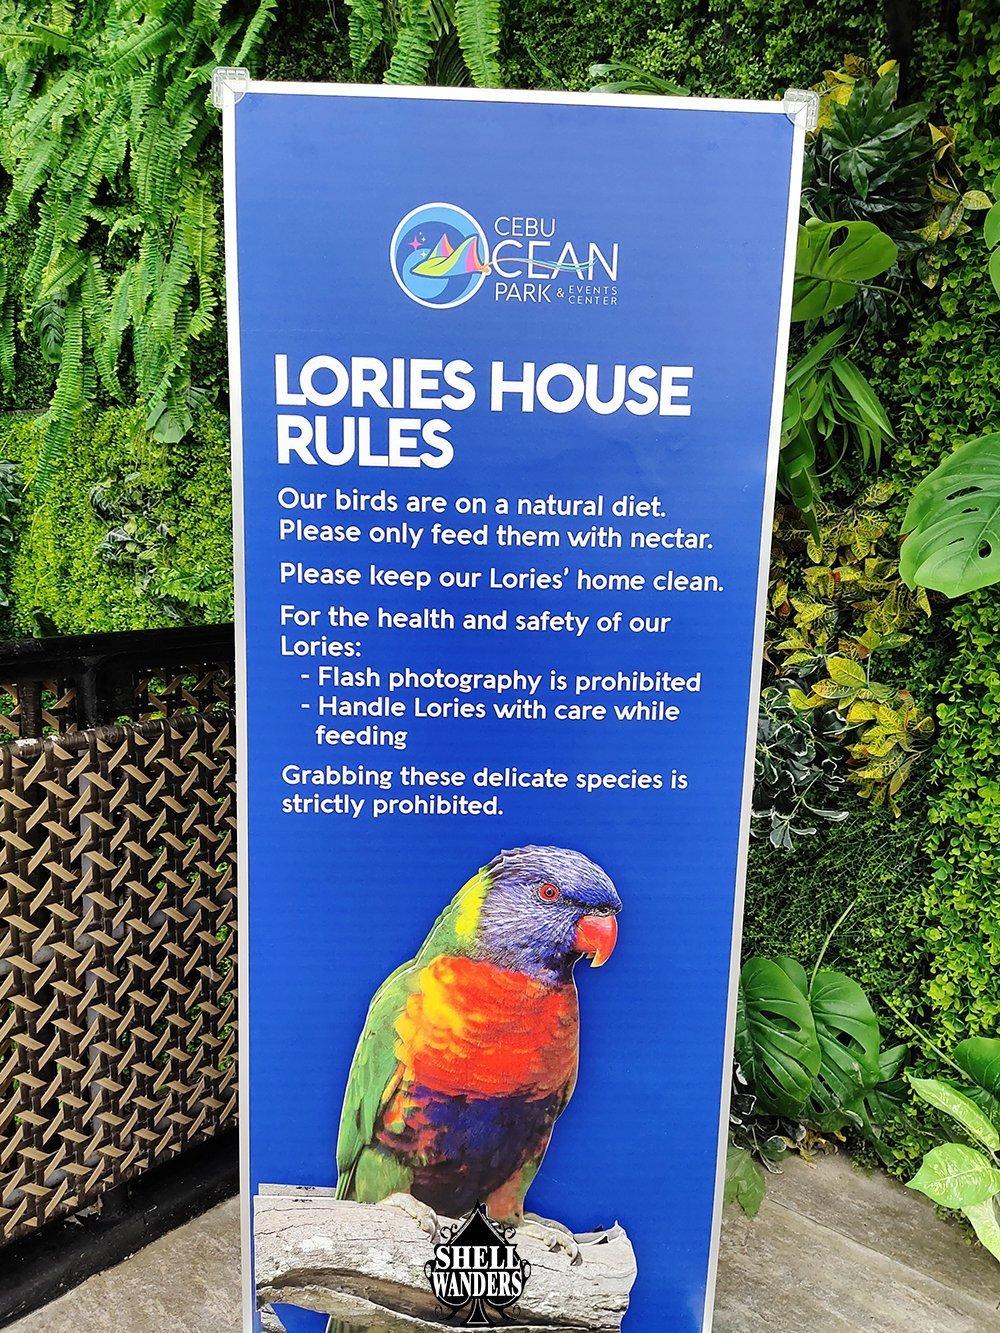 Bird Feeding Lories Cebu Ocean Park